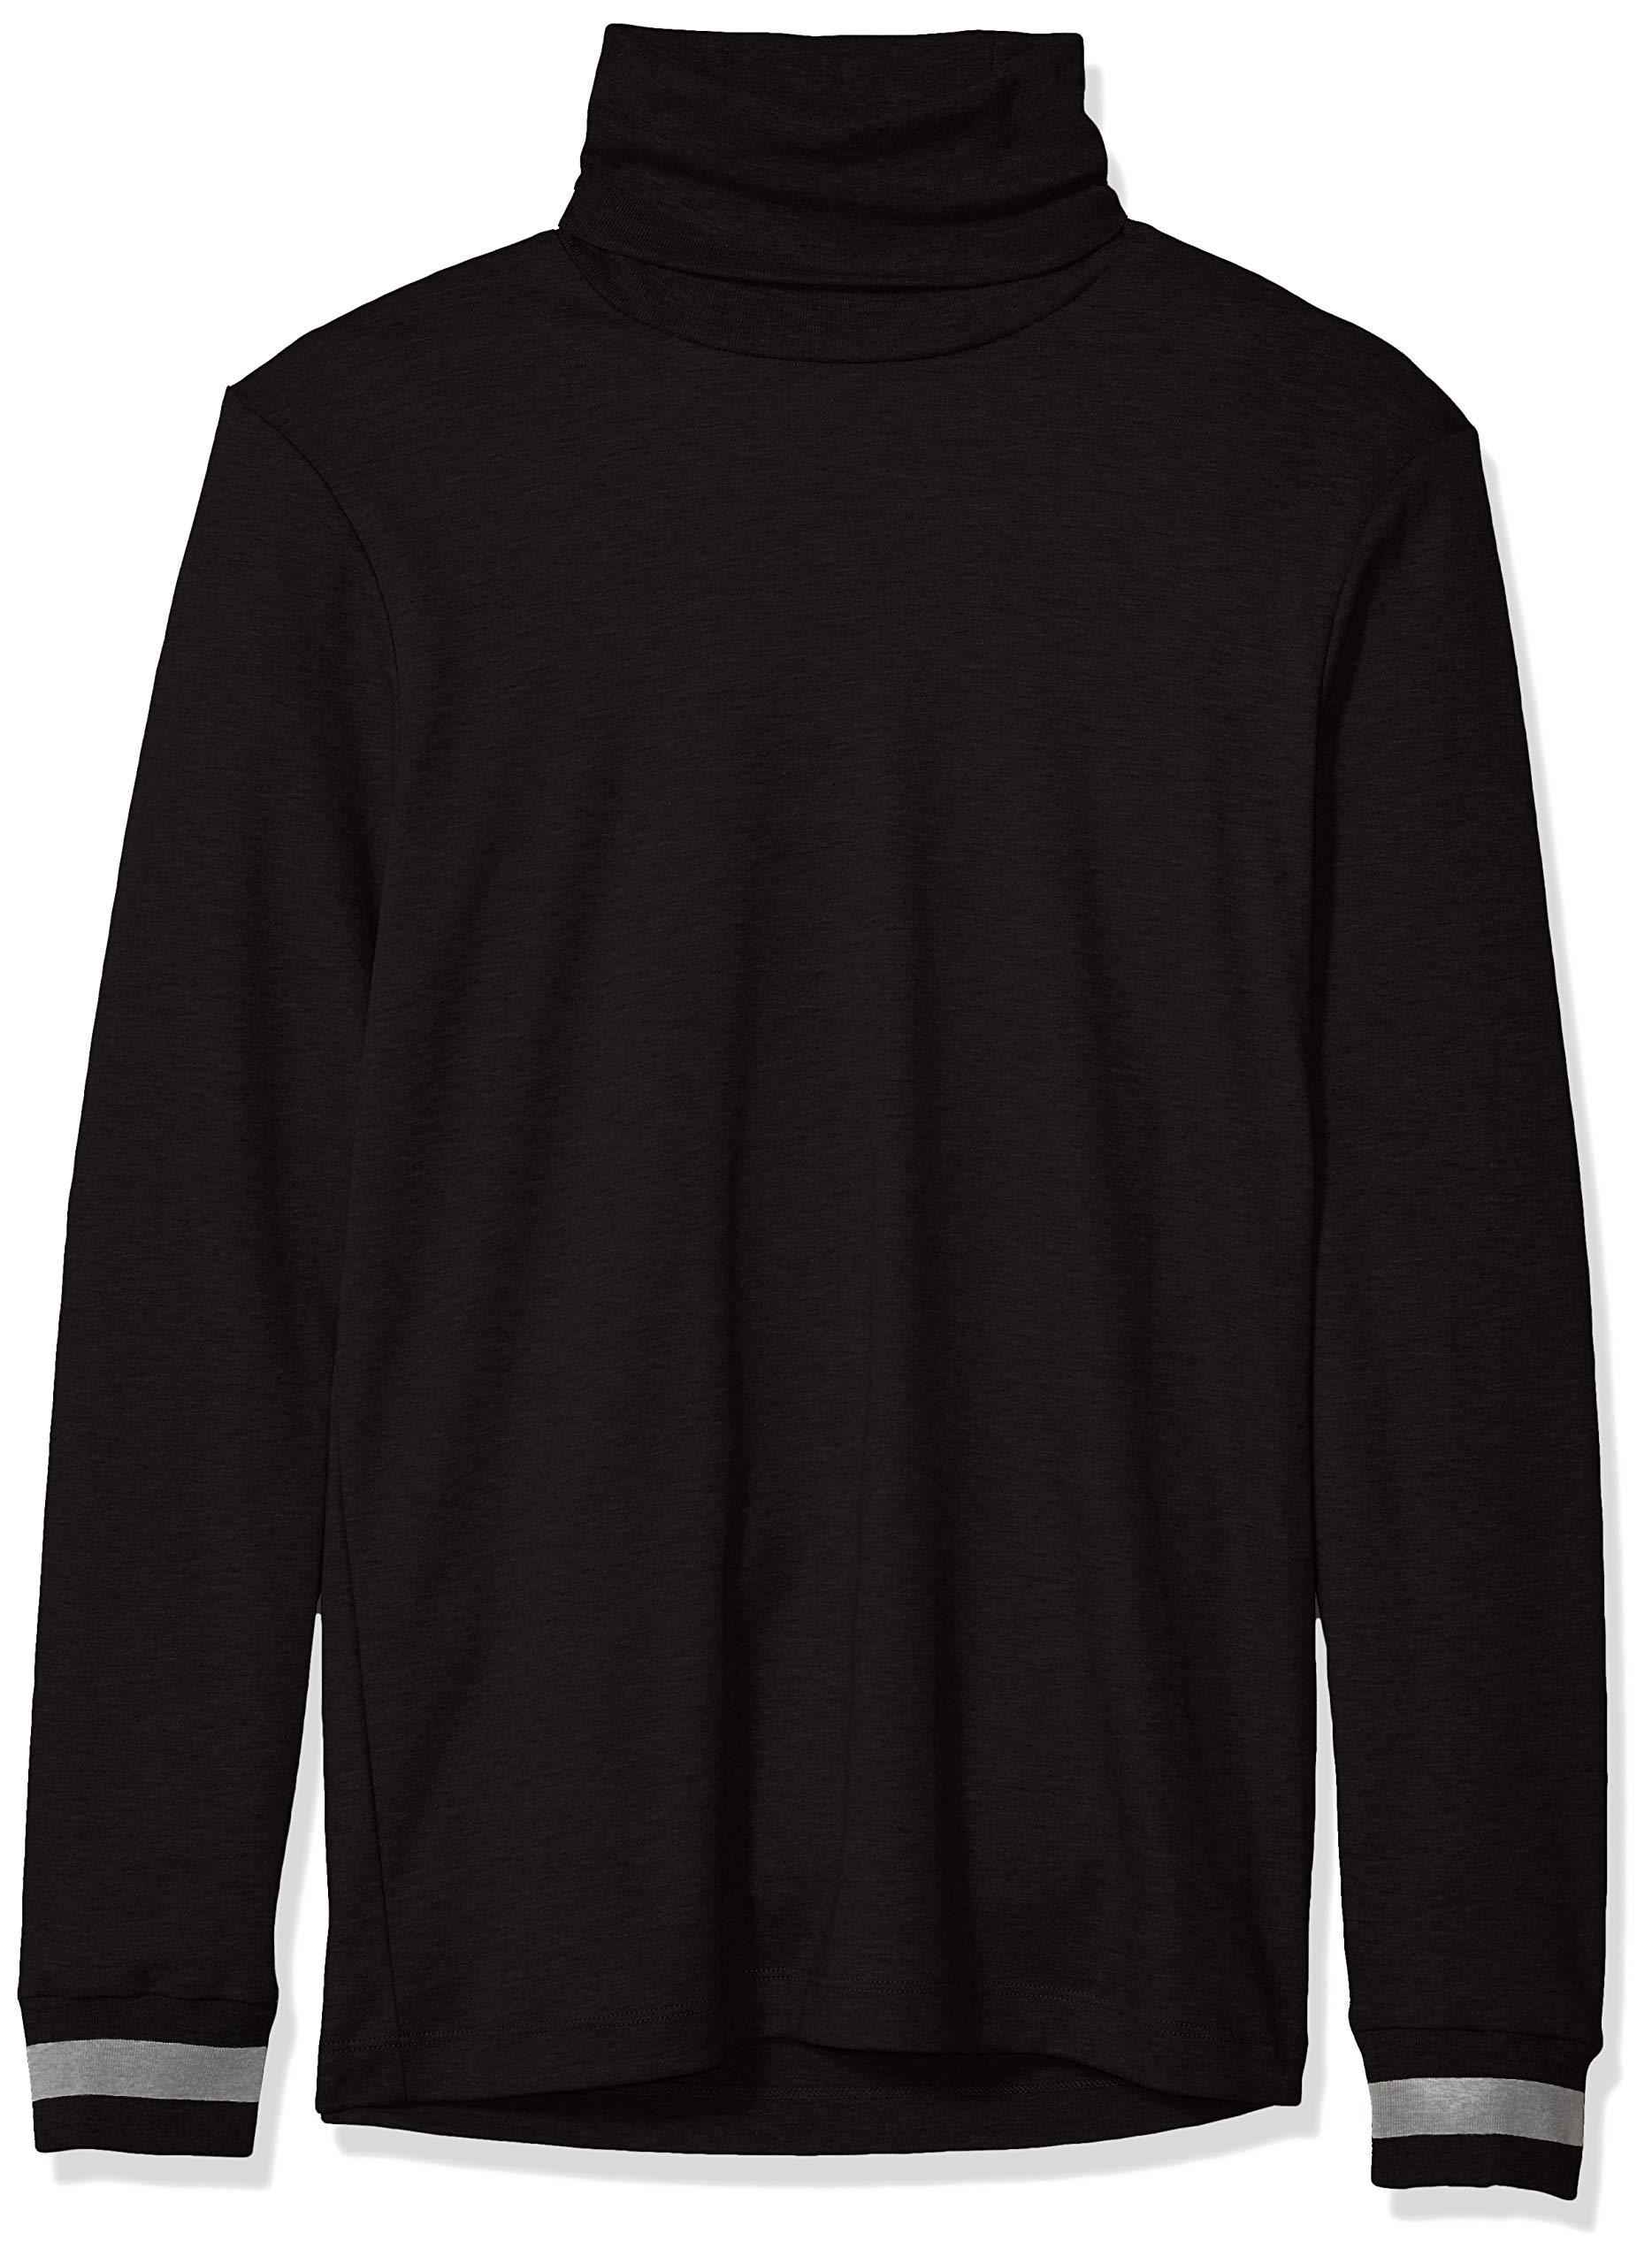 Calvin Klein Men's Long Sleeve Turtleneck Sweater, Black X-Small